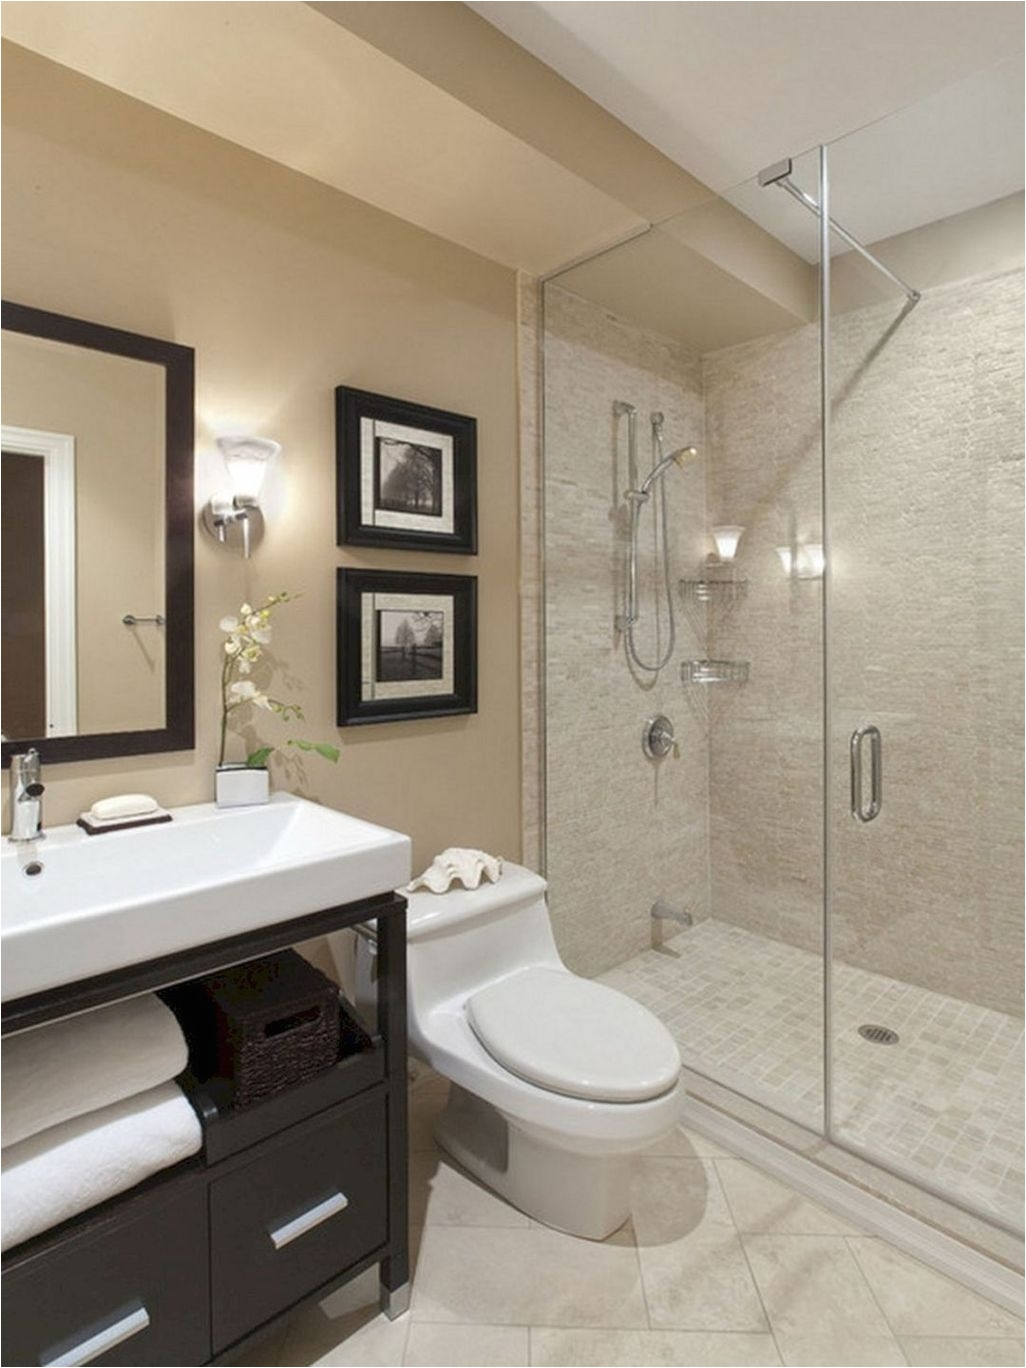 47 Modern Contemporary Bathroom Design Ideas Bathroom Inspiration Design Pinterest